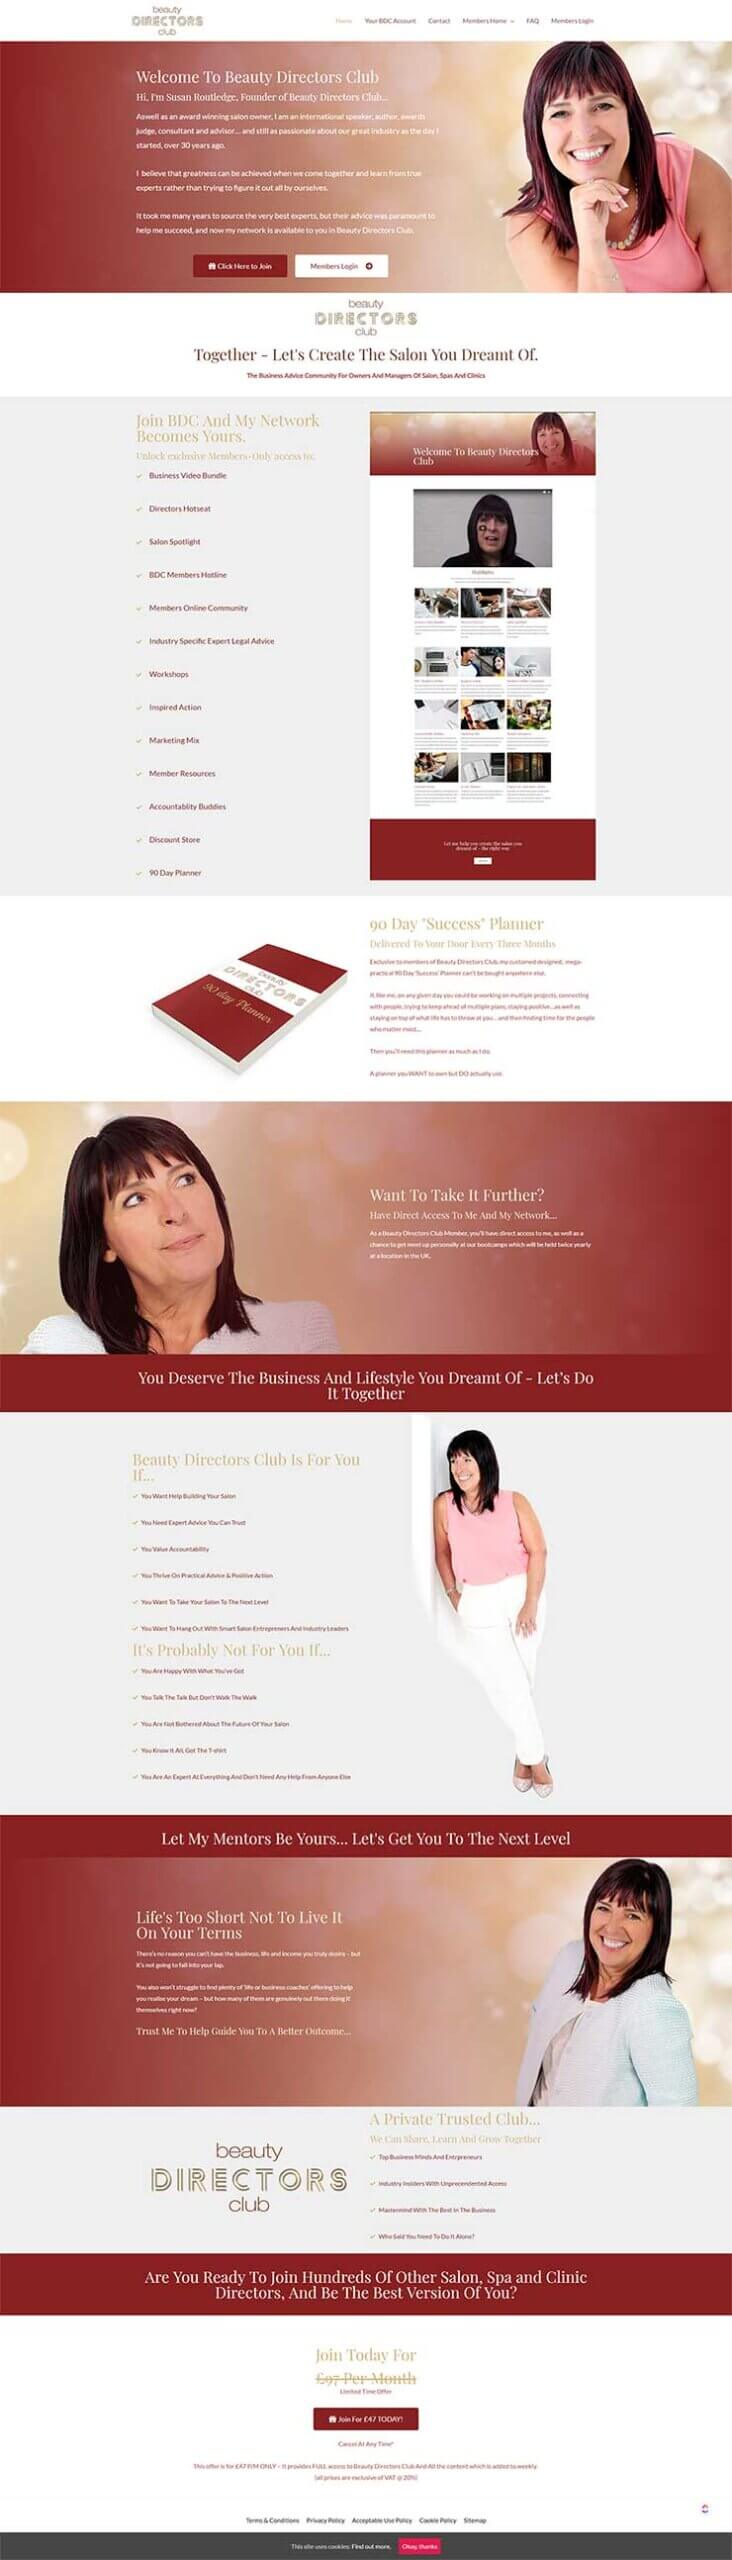 beauty directors club homepage